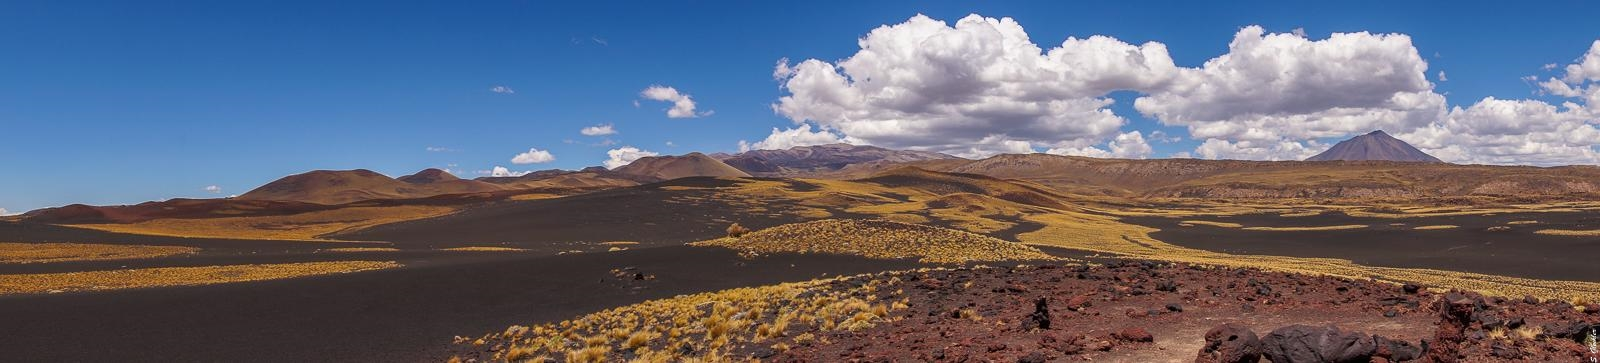 La Payunia: Bunte Vulkanlandschaft